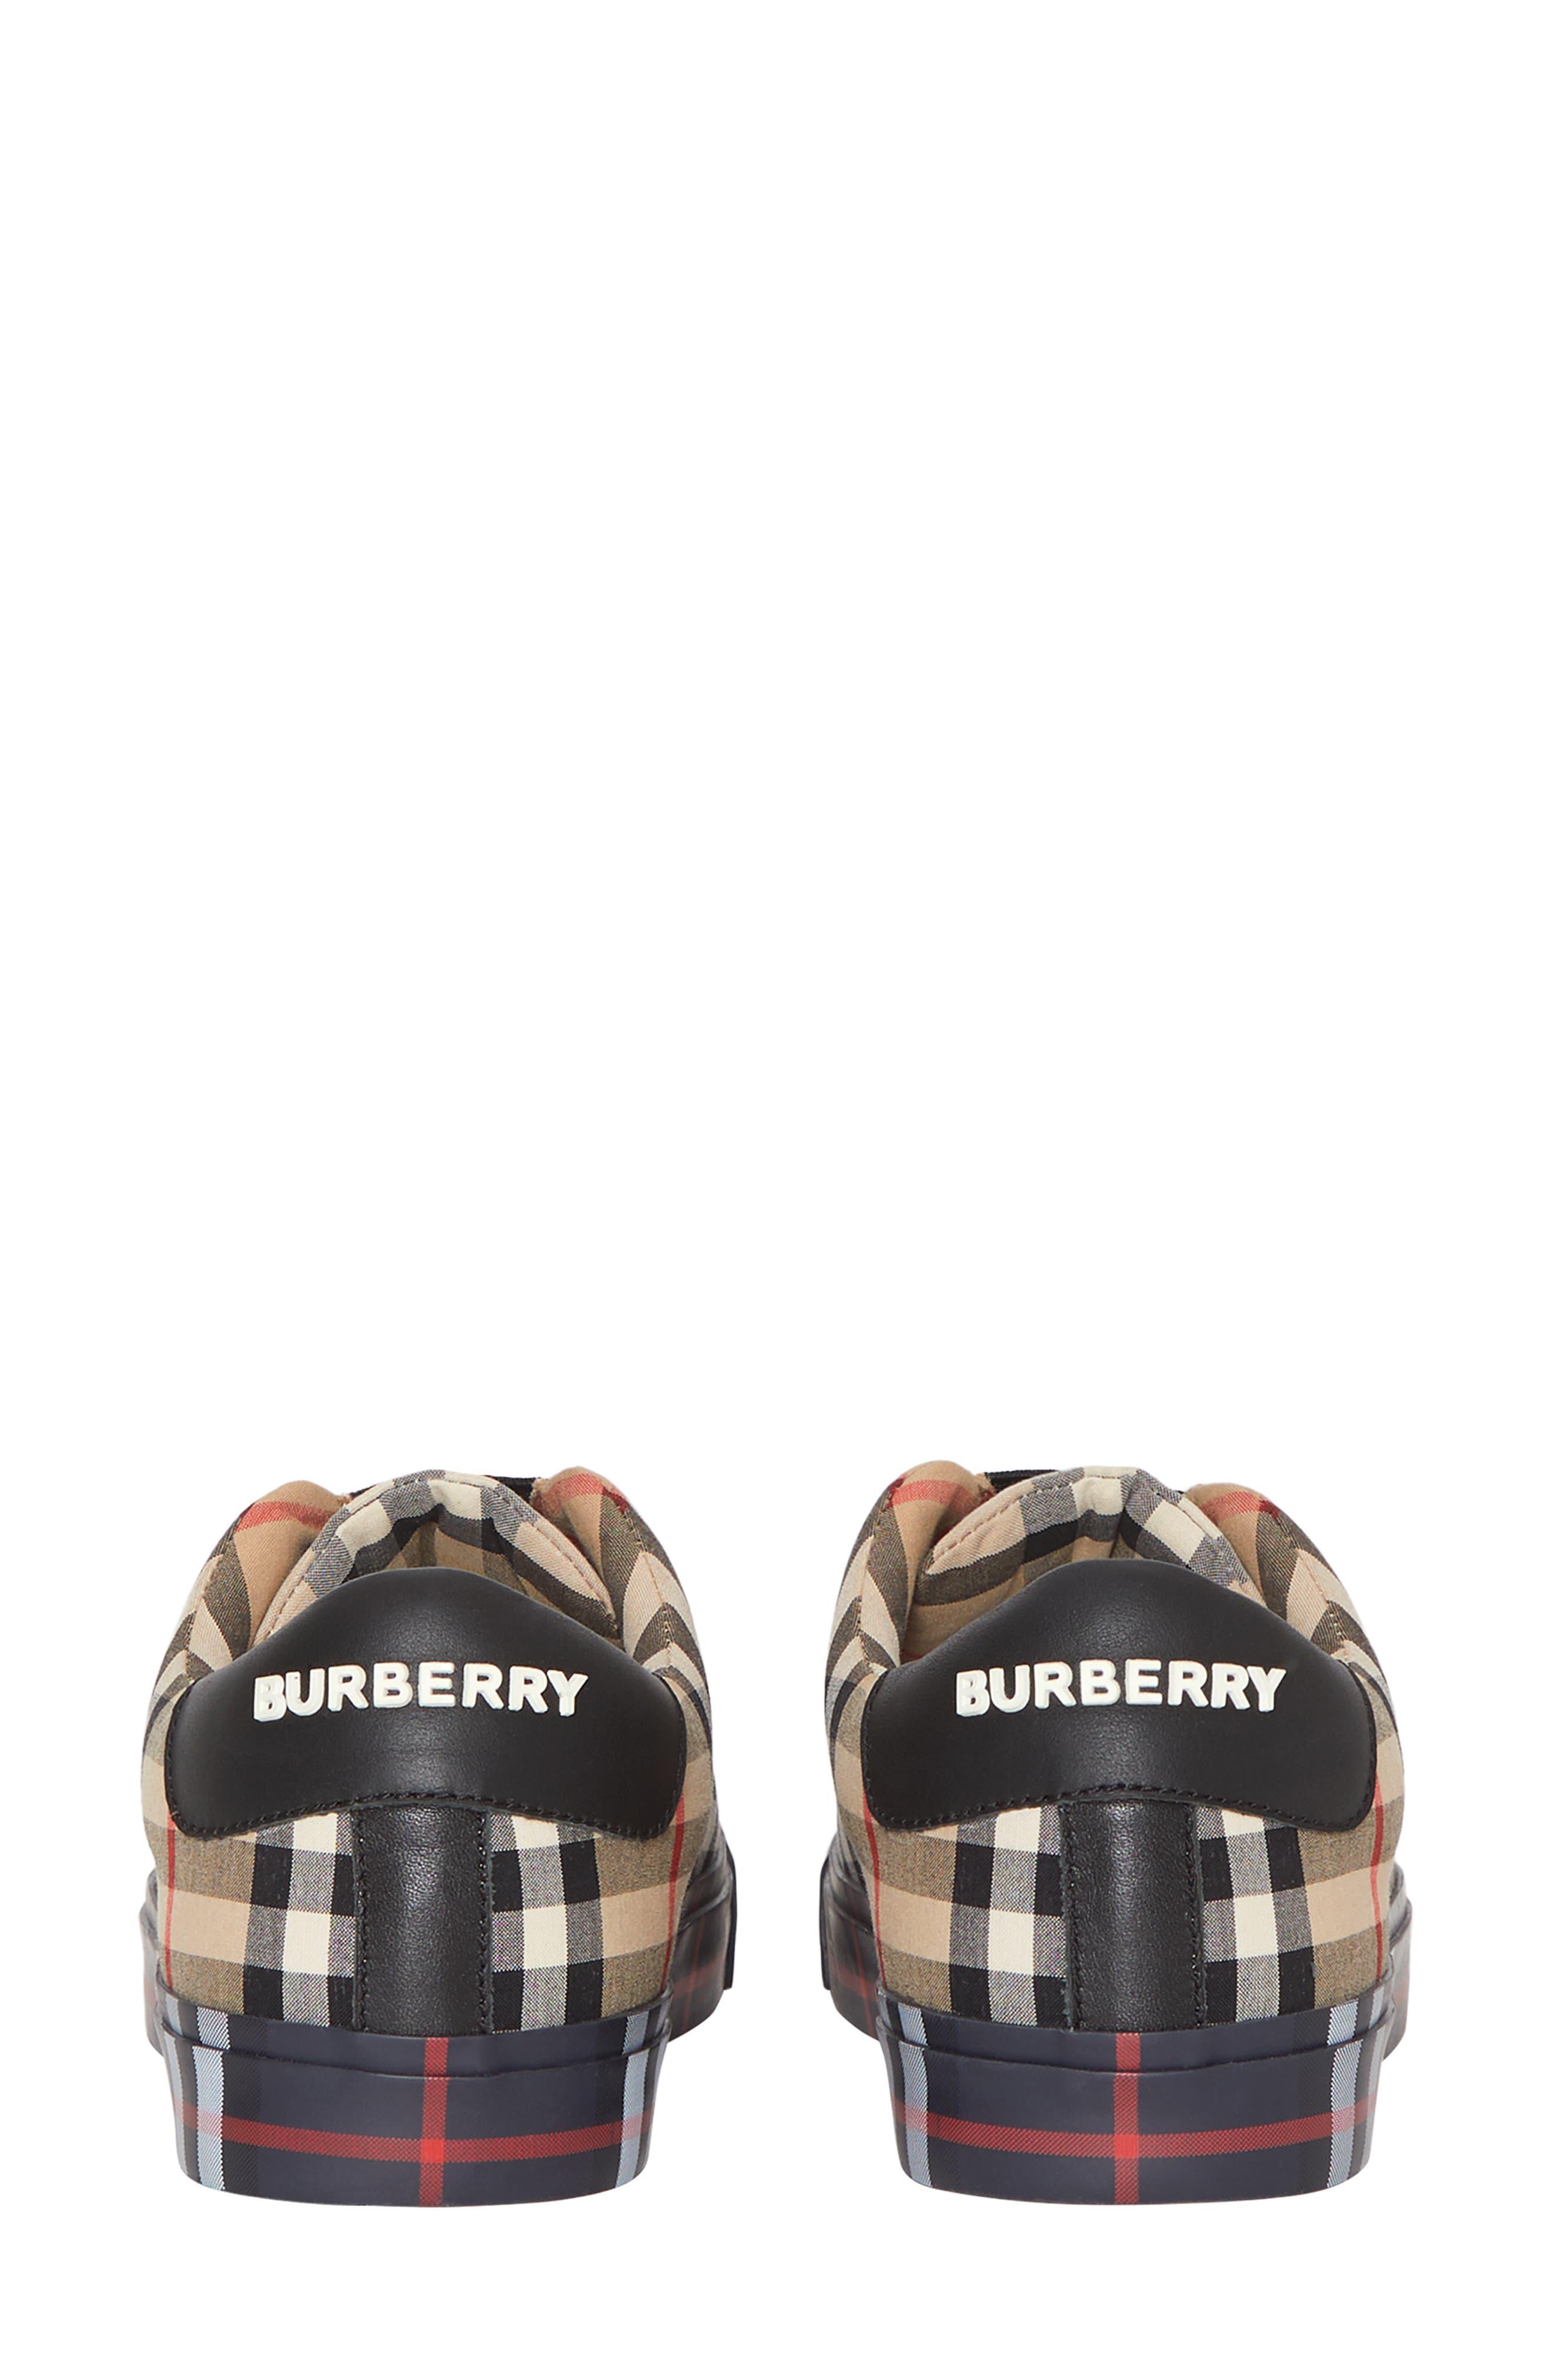 BURBERRY, Markham Vintage Check Slip-On Sneaker, Alternate thumbnail 6, color, BEIGE PLAID